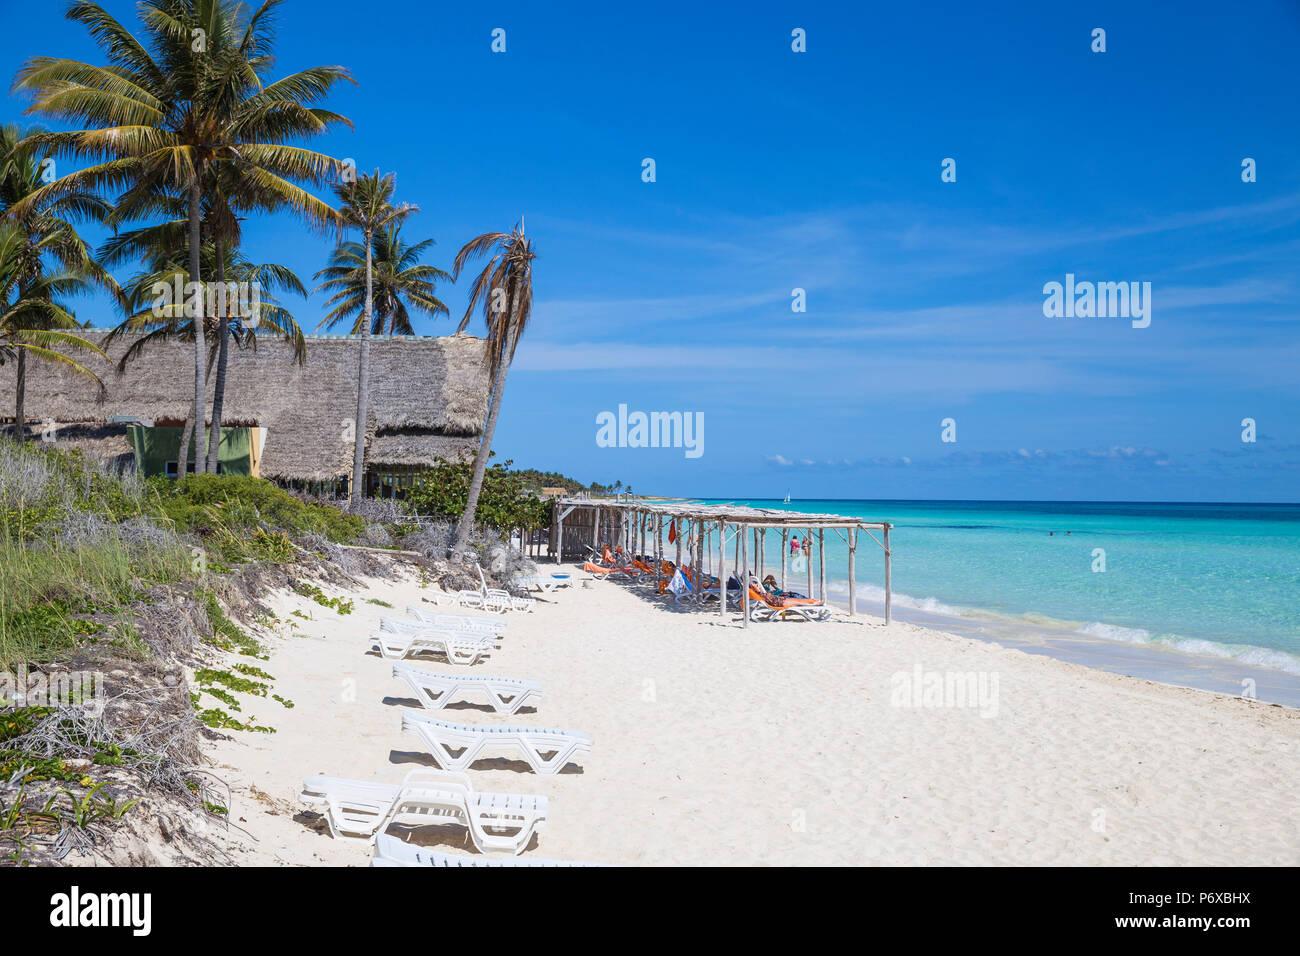 Cuba, Jardines del Rey, Cayo Coco, Playa Larga Immagini Stock